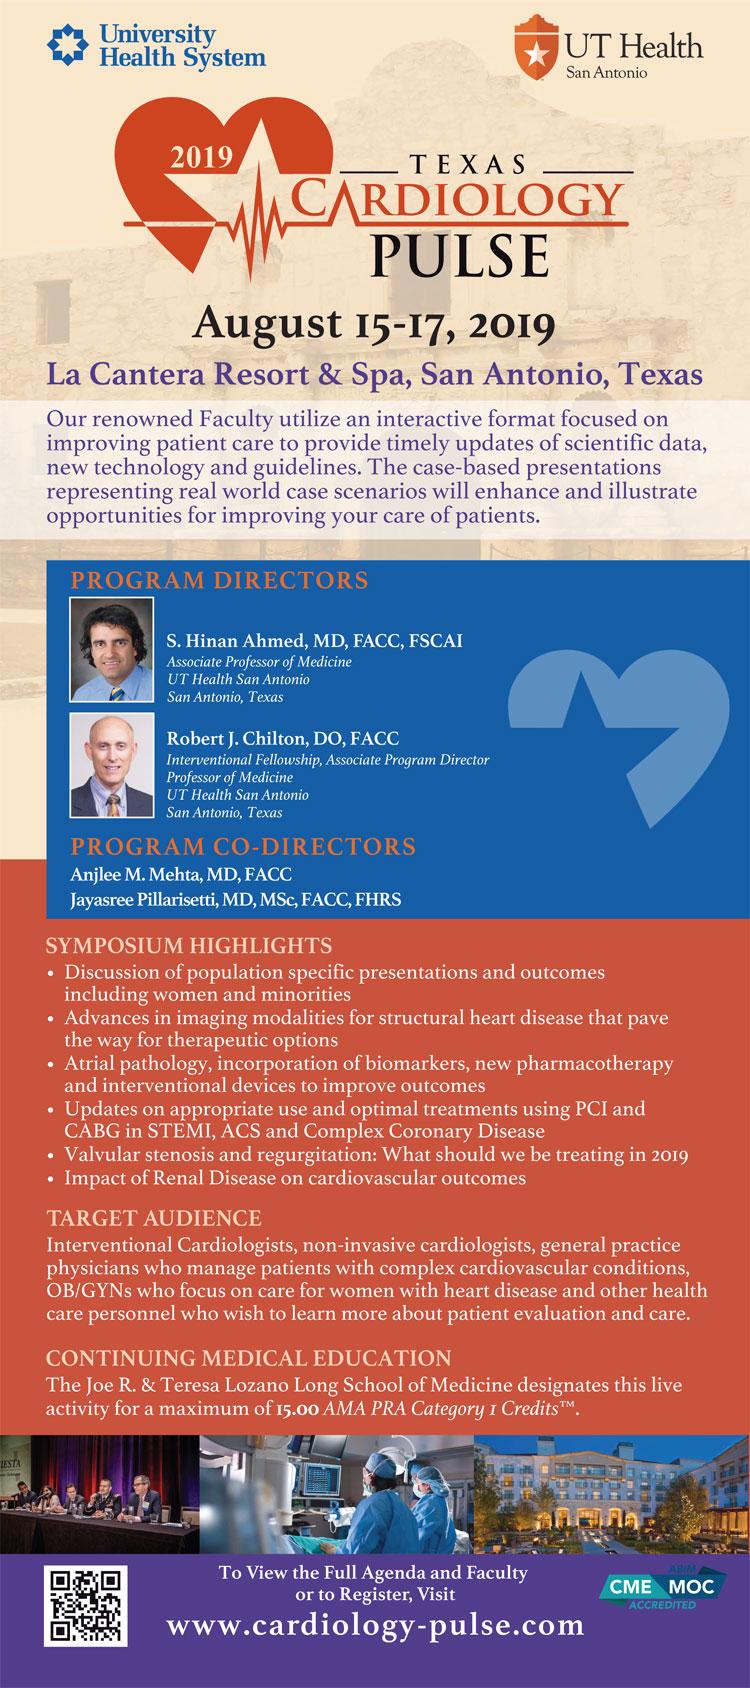 STRAC - Southwest Texas Regional Advisory Council